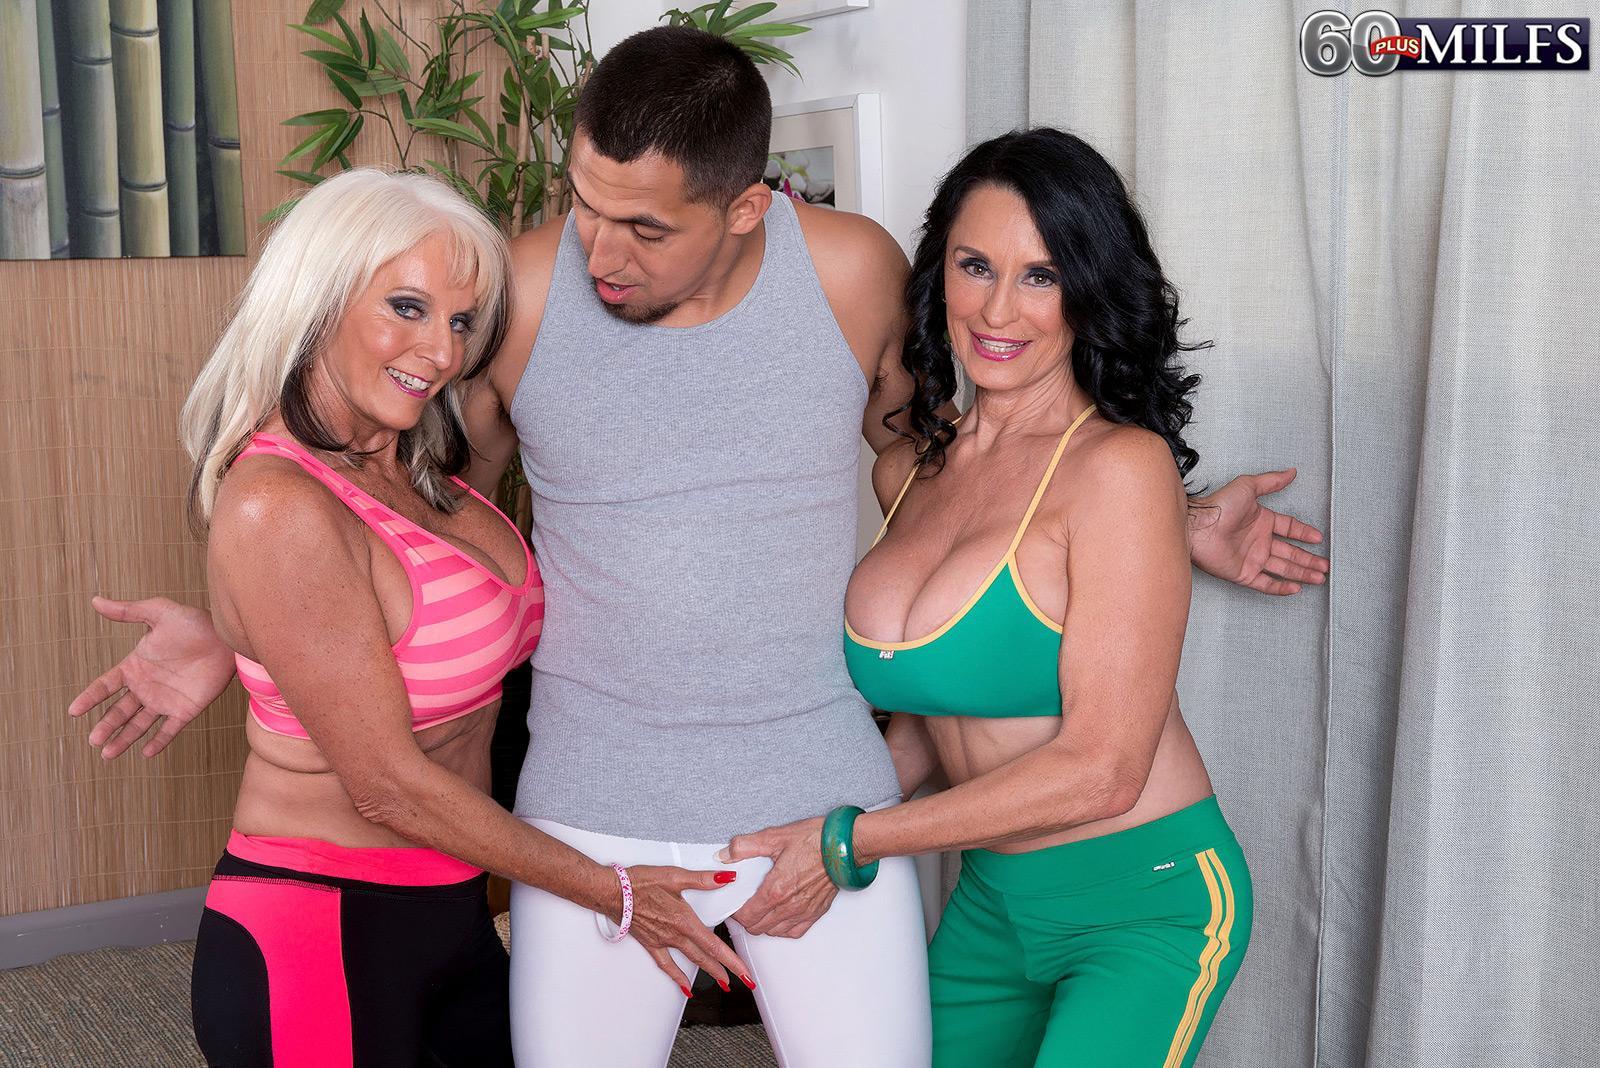 Grandma adult flick starlets Sally D'Angelo and Rita Daniels press large breasts together in Threeway